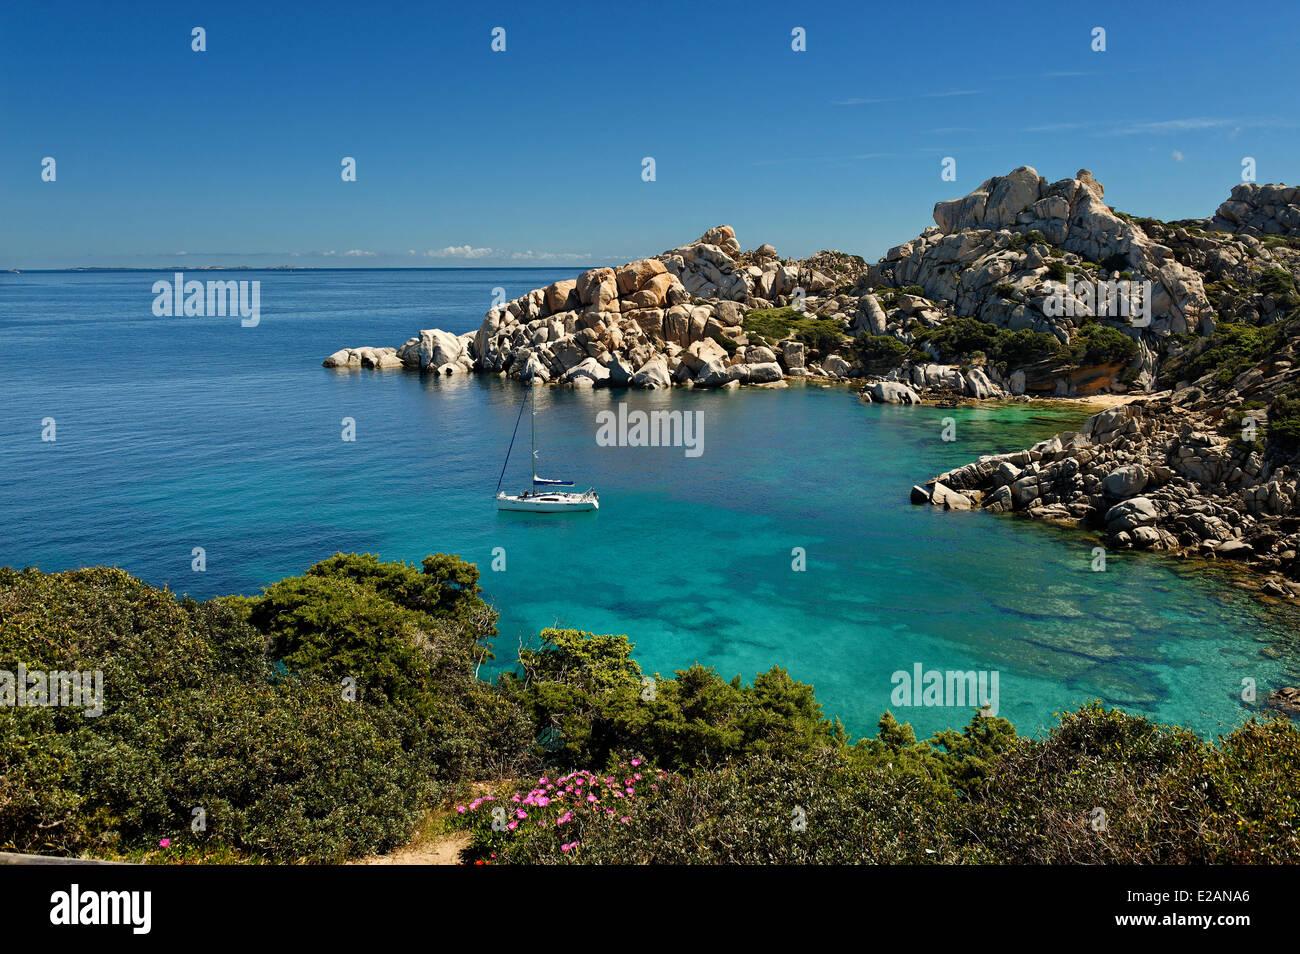 Italy, Sardinia, Olbia Tempio Province, Santa Teresa Gallura, Capo Testa, granite peninsula overlooking the Strait - Stock Image